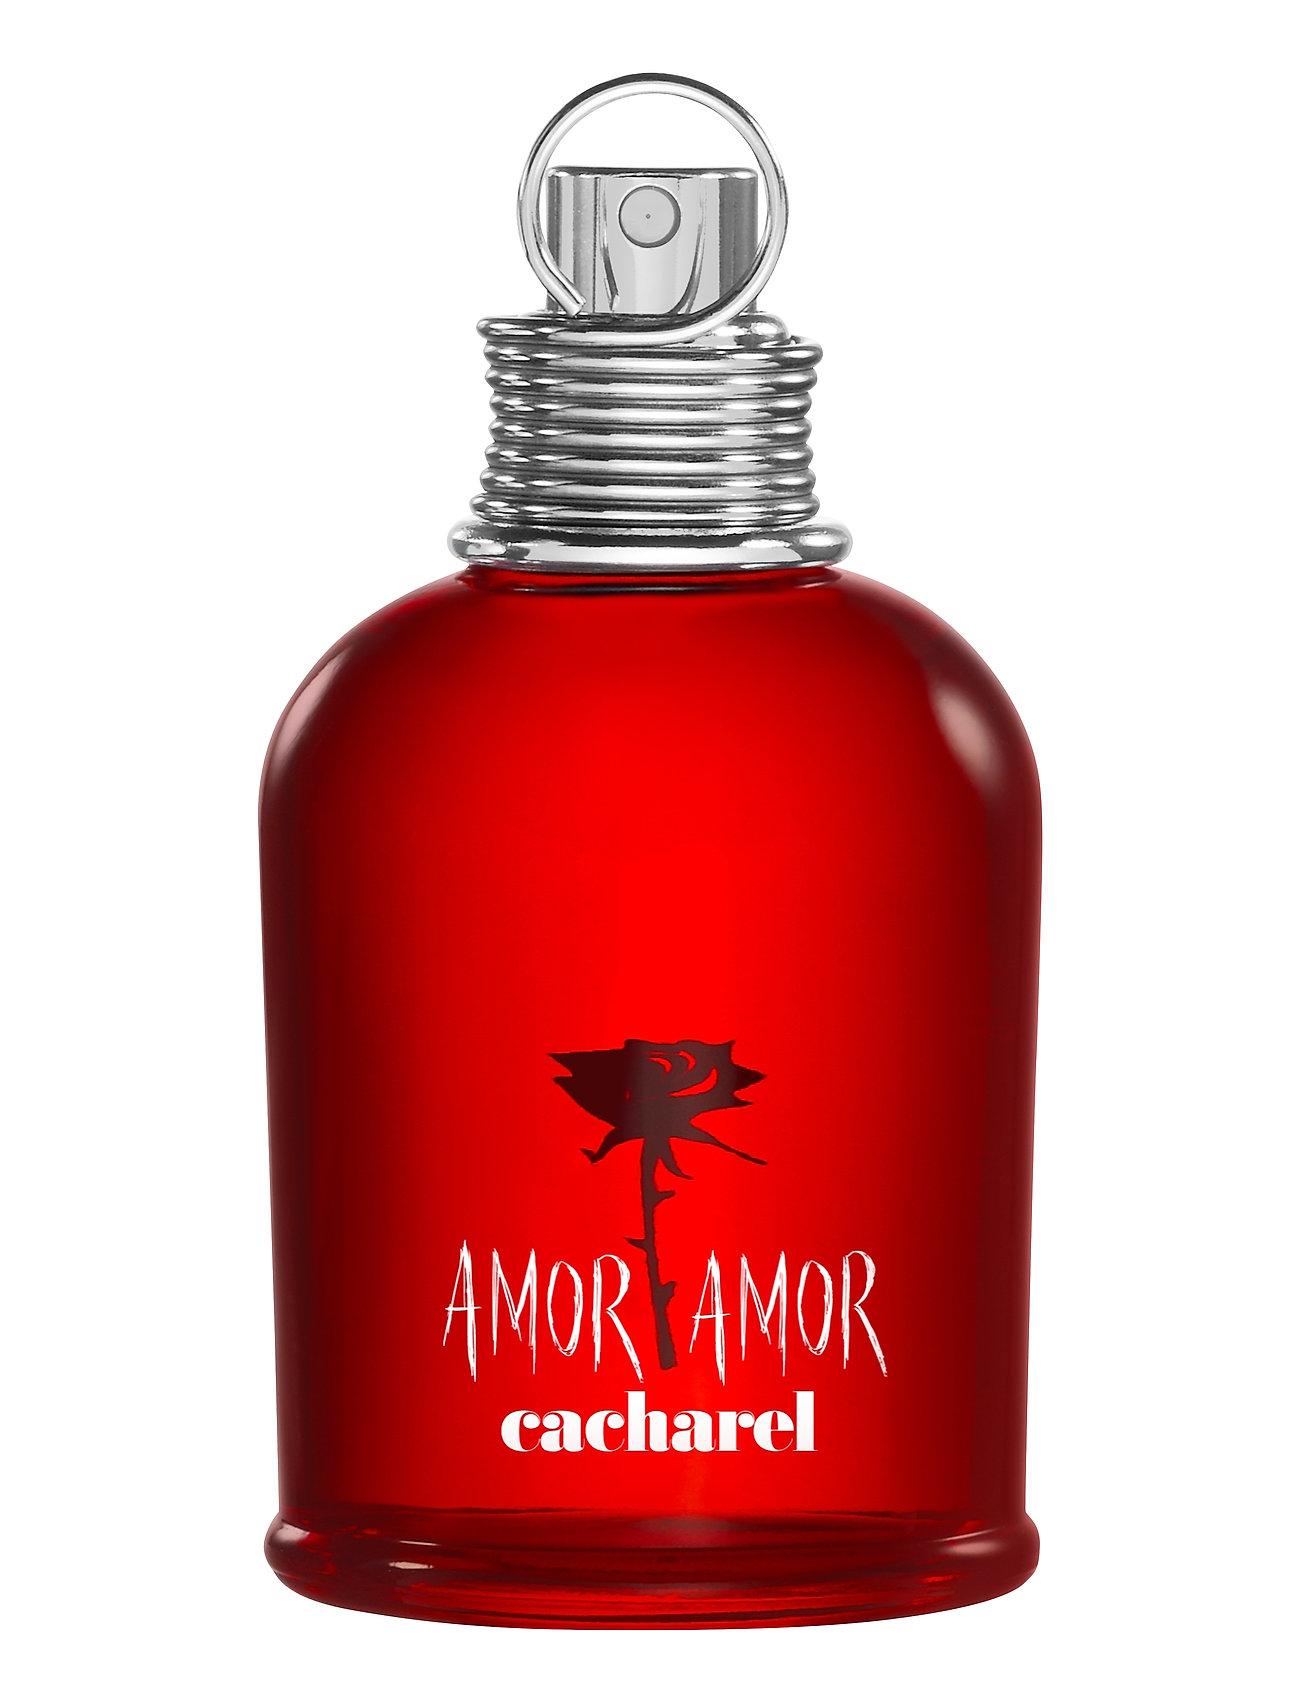 cacharel Amor amor eau de toilette spray 50 ml fra boozt.com dk